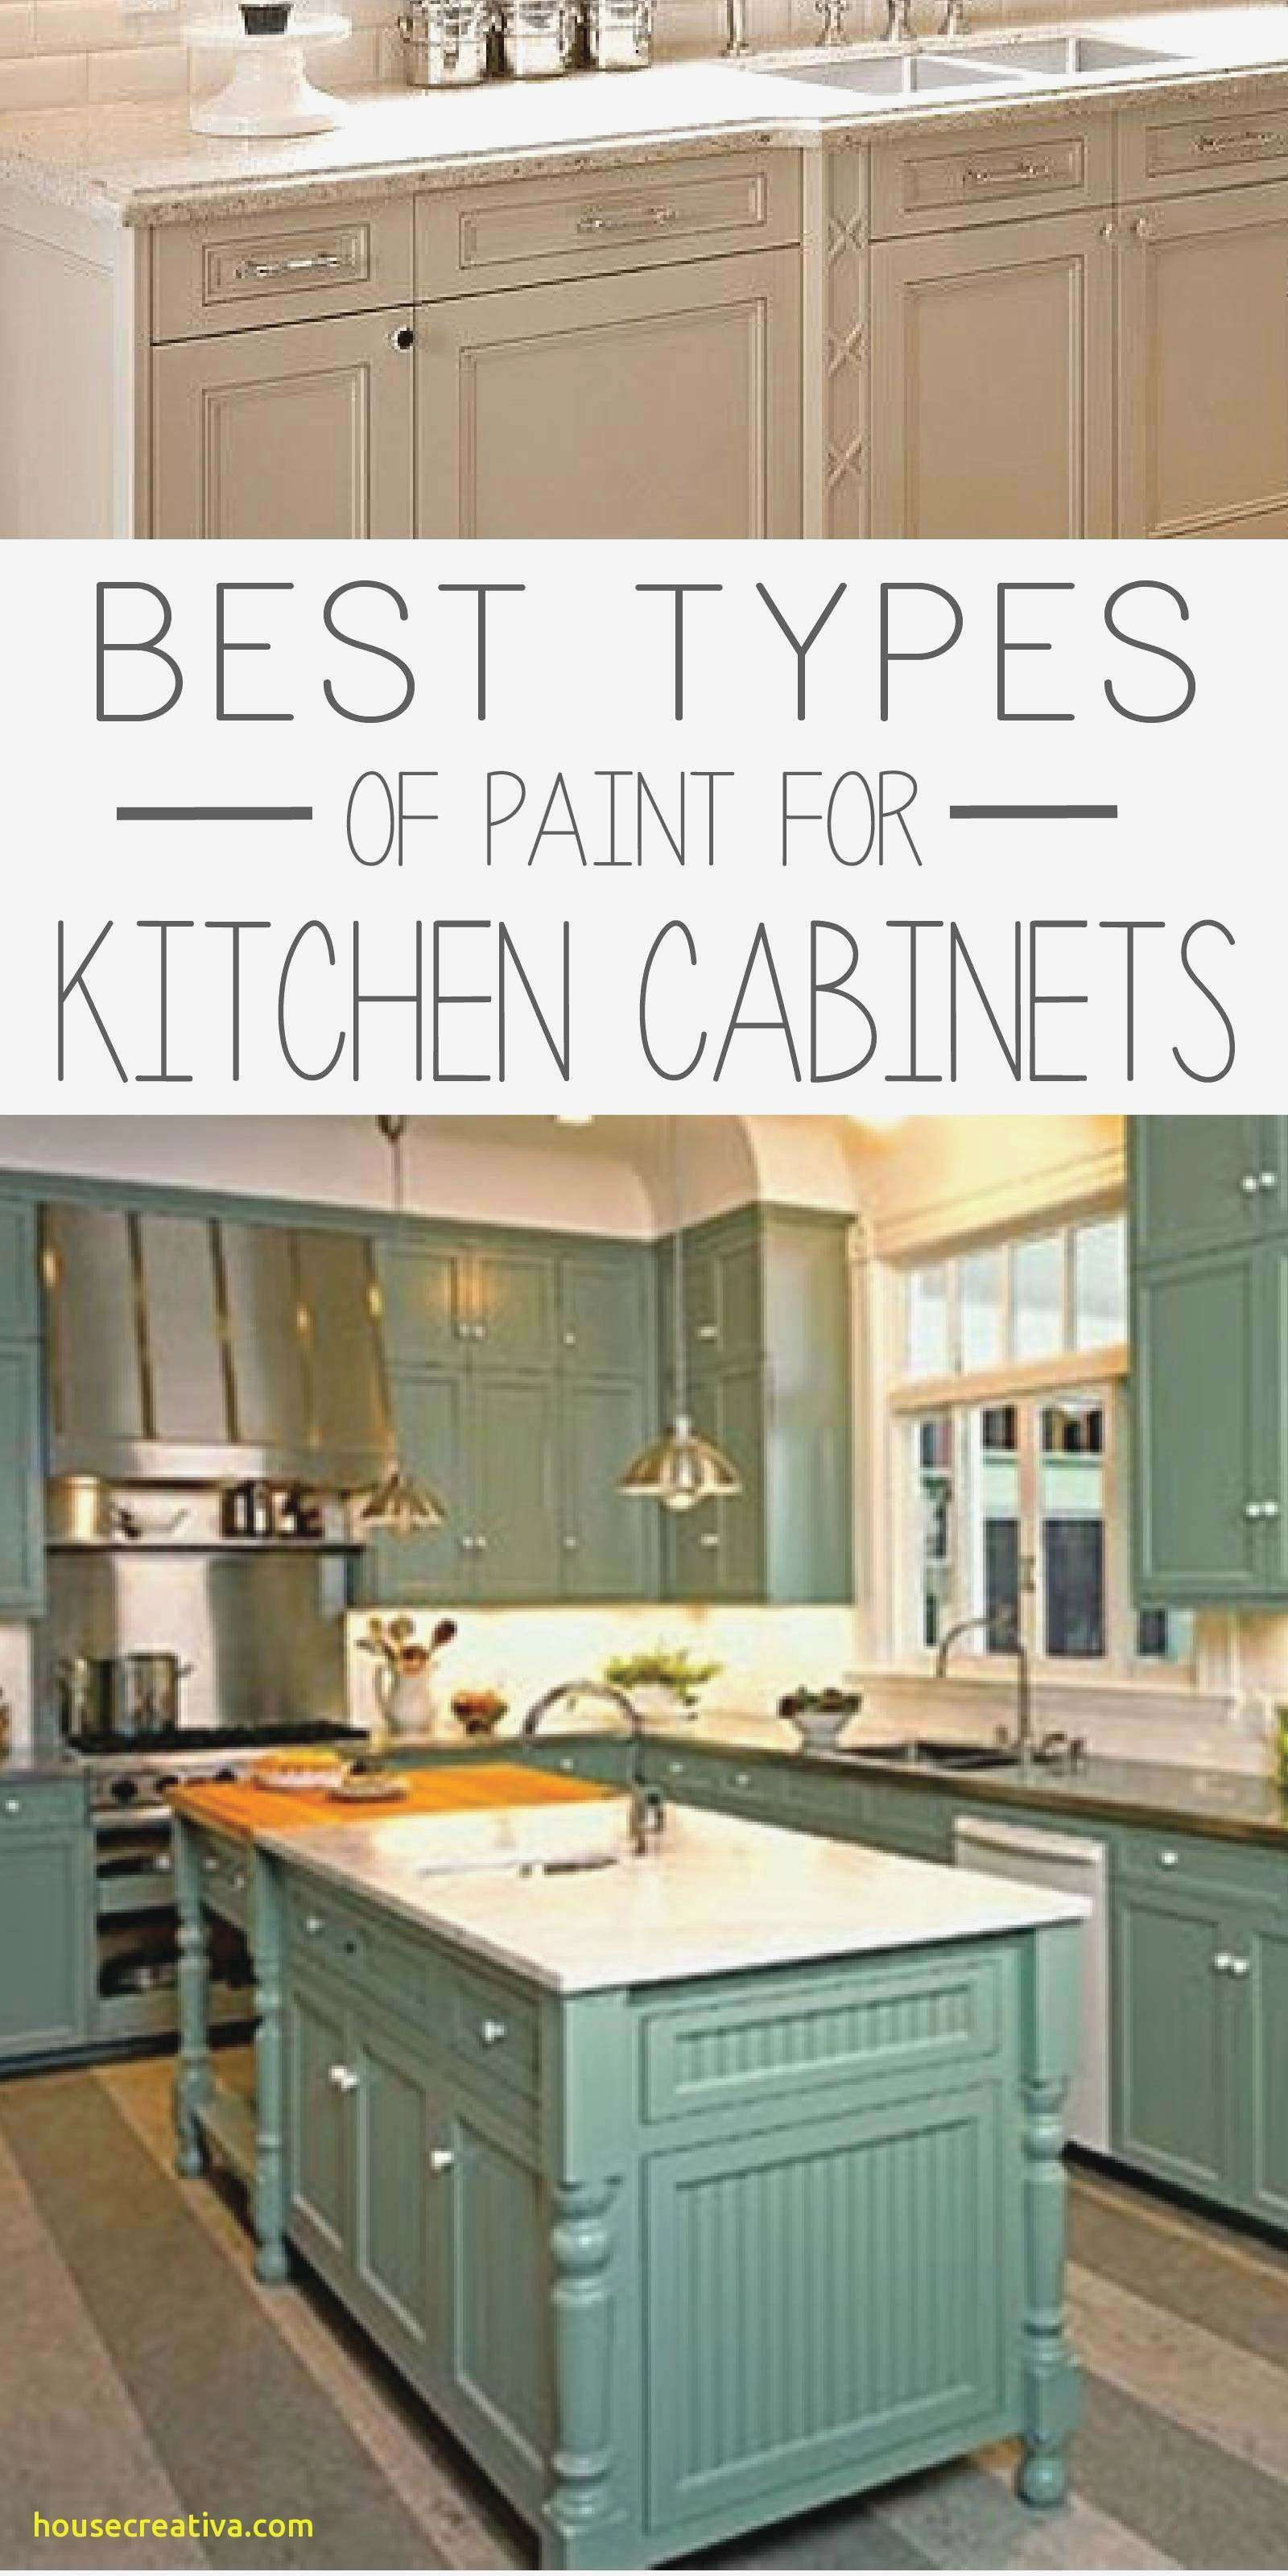 Kitchencabinetscost Outdoor Kitchen Cabinets Modern Kitchen Wall Decor Metal Kitchen Cabinets